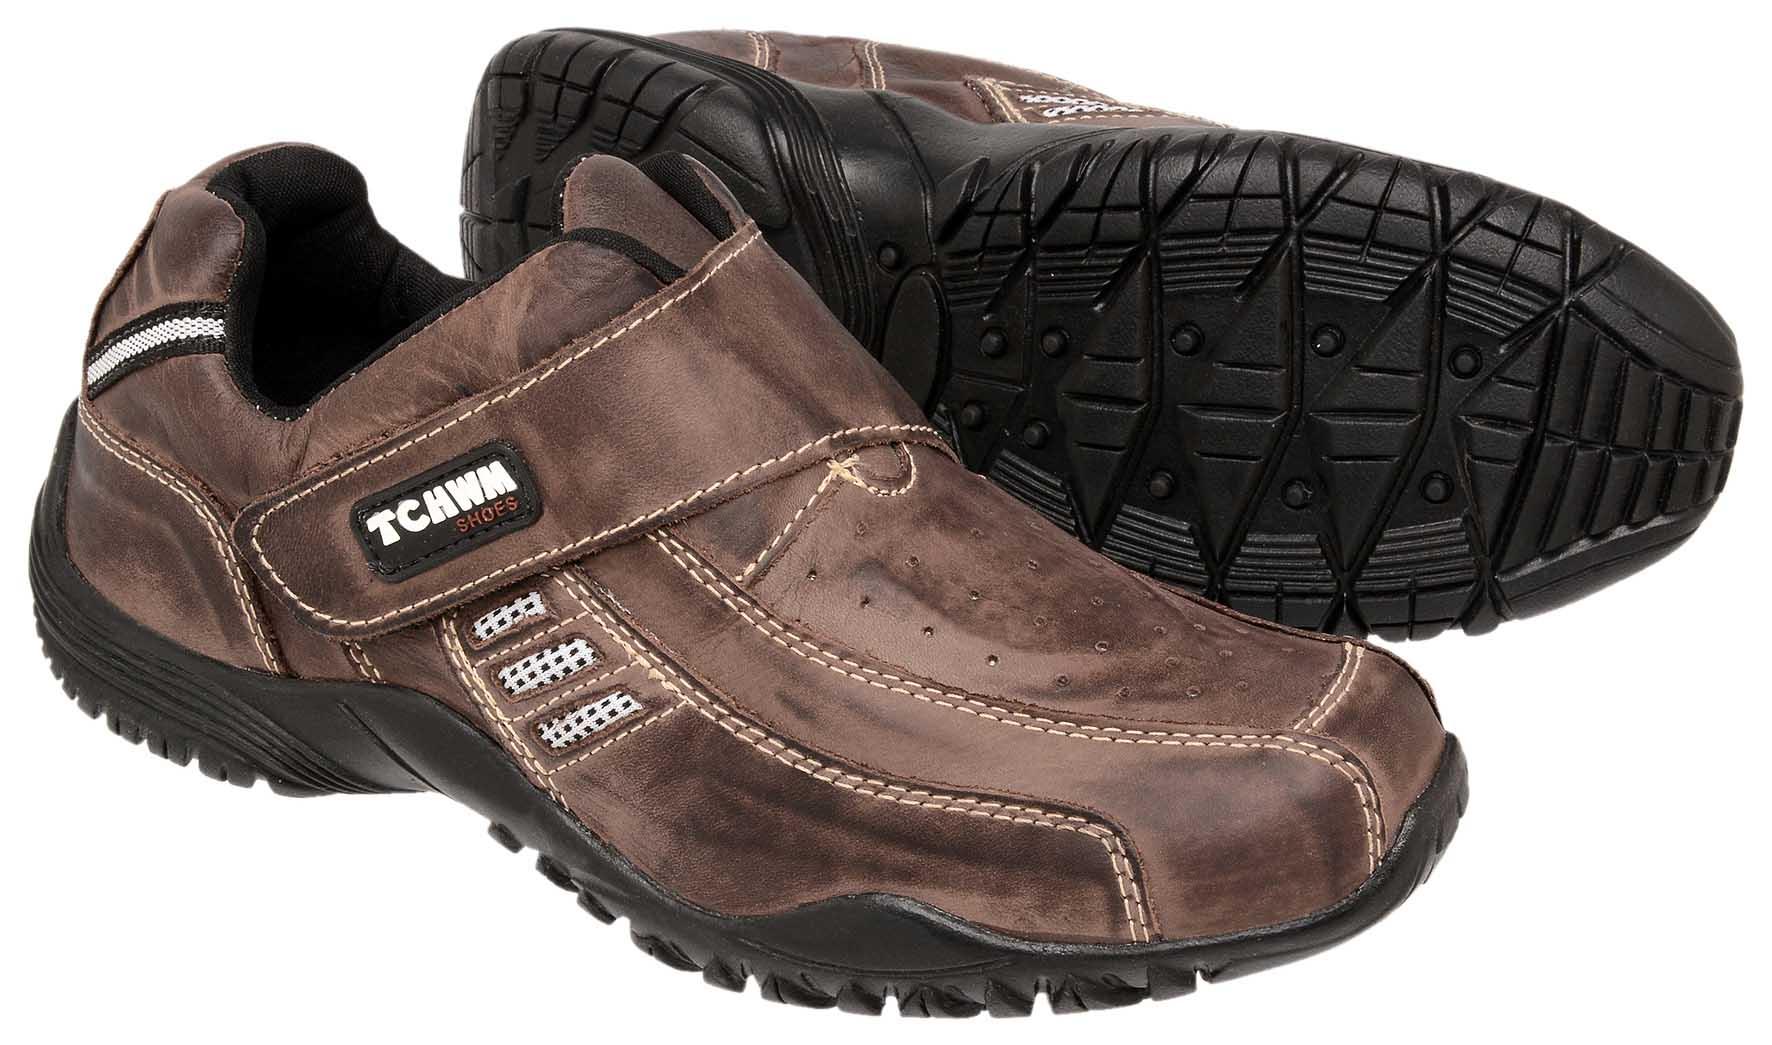 dd061acc4e ... Sapatênis Masculino Tchwm Shoes Couro - Marrom ...